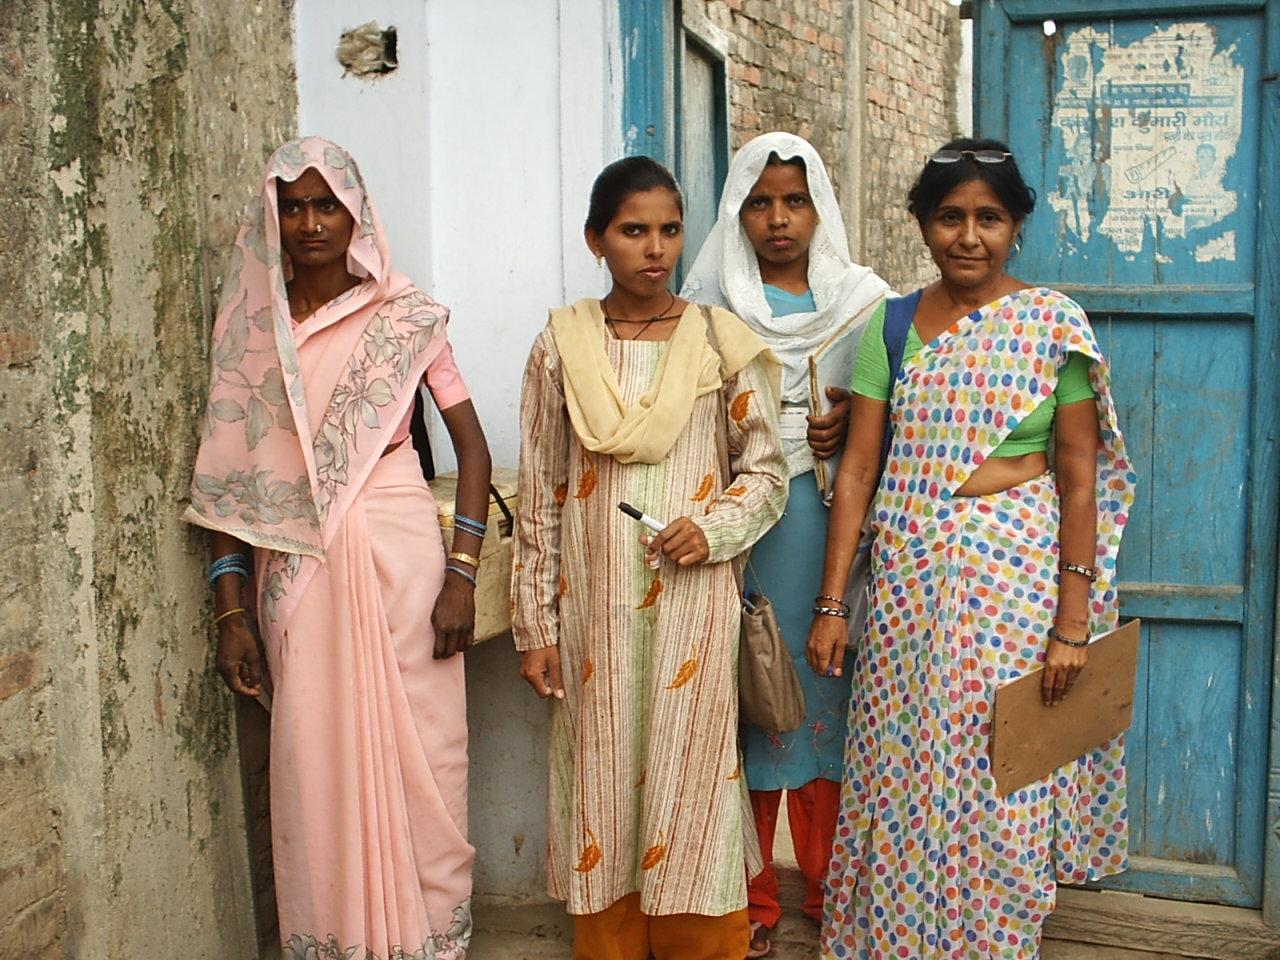 female health community worker in India